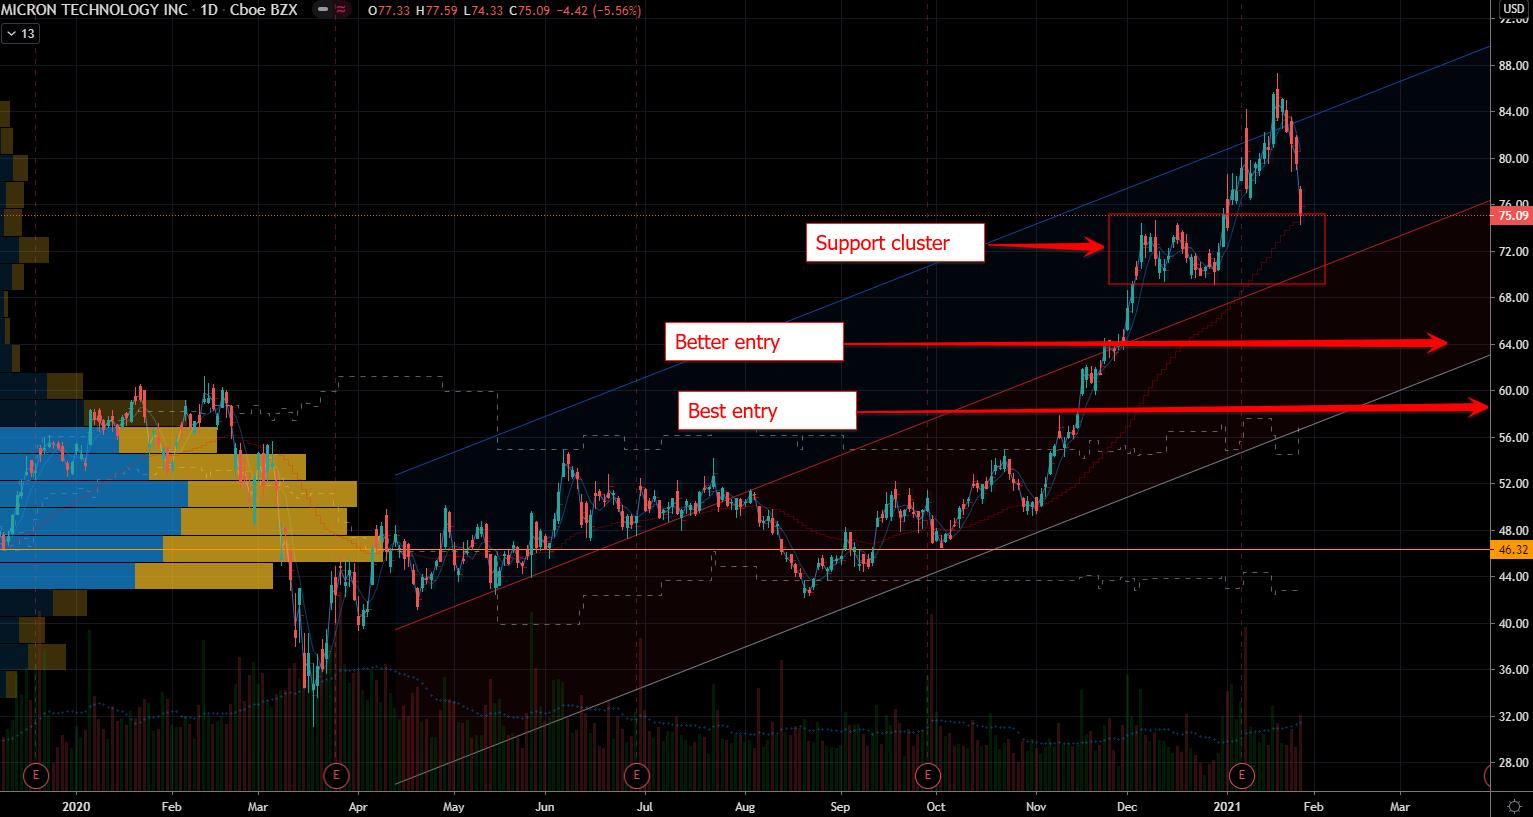 Mega-cap Stocks: Micron (MU) Stock Chart Showing Better Entry Spots